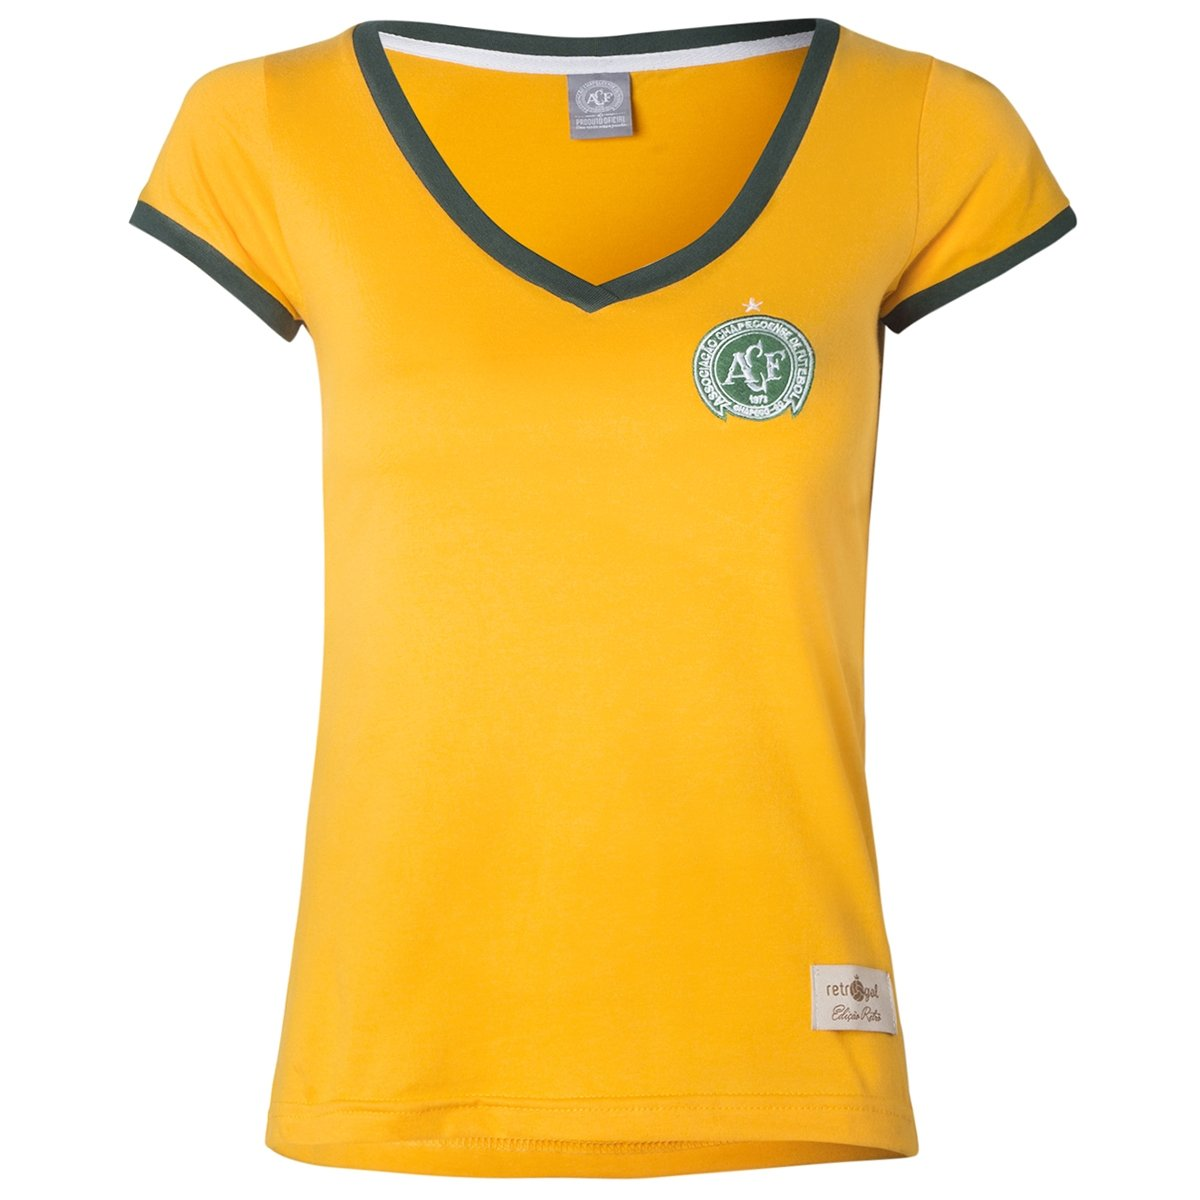 Seleção Baby Feminina Brasil Retrô Torcedor Amarelo Camisa Chapecoense Gol Look Yd5vPWq